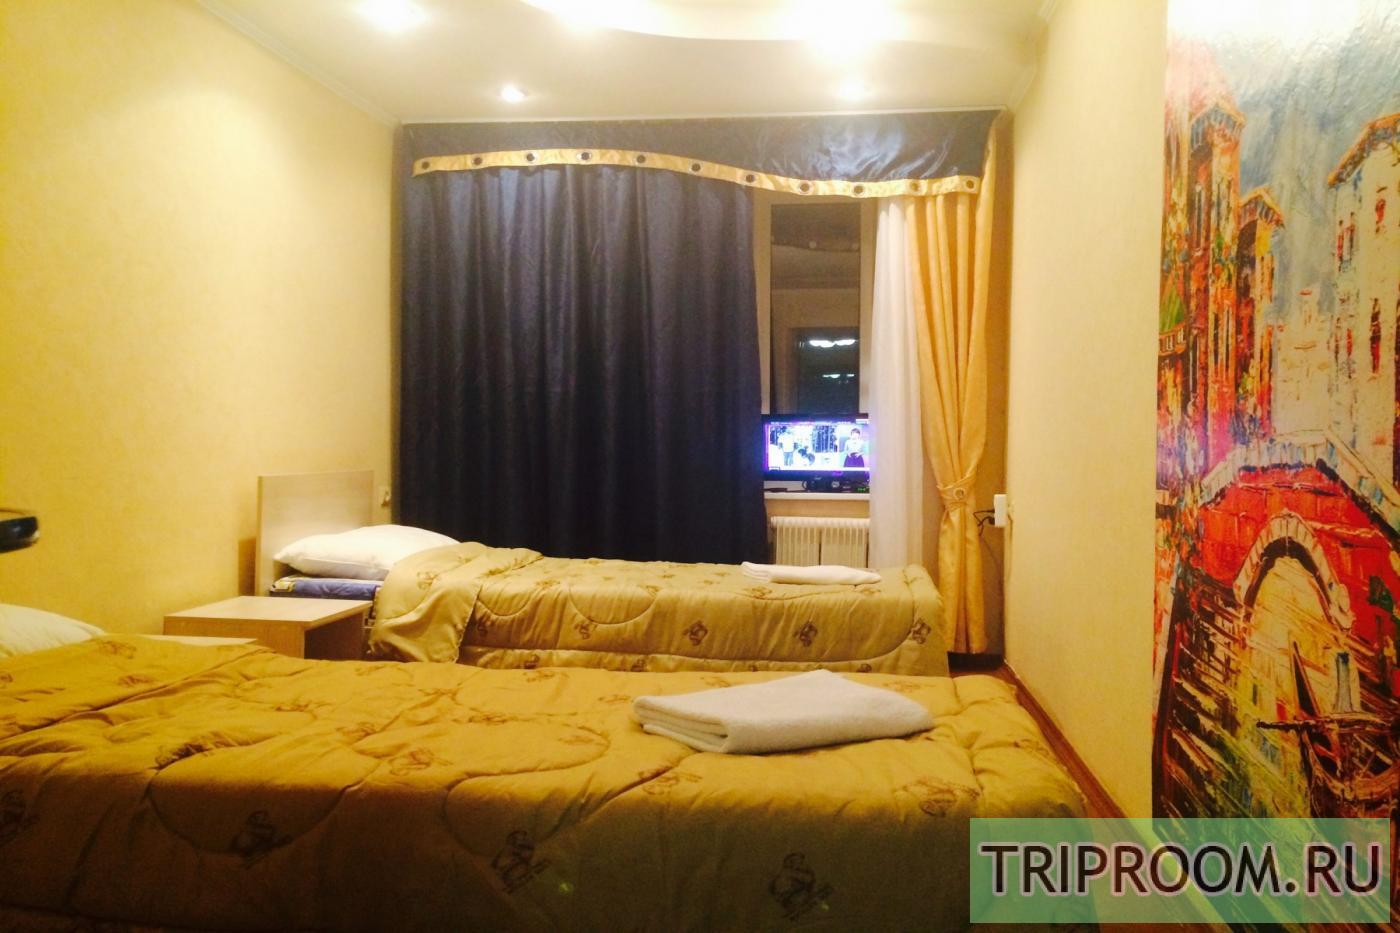 3-комнатная квартира посуточно (вариант № 33462), ул. Оганова улица, фото № 15